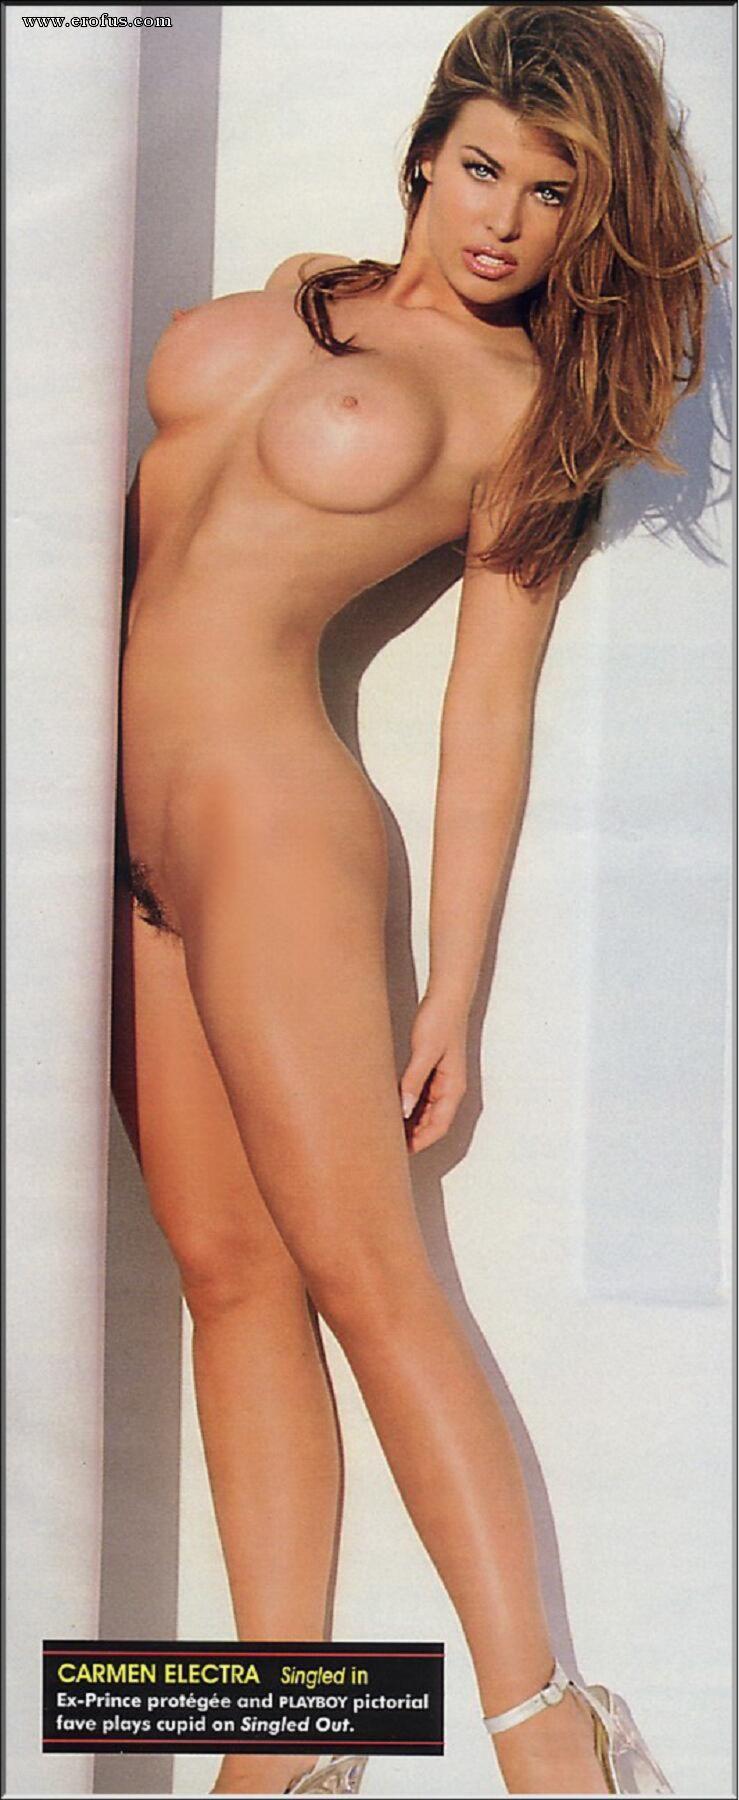 Carmen electra fake nude pics #3